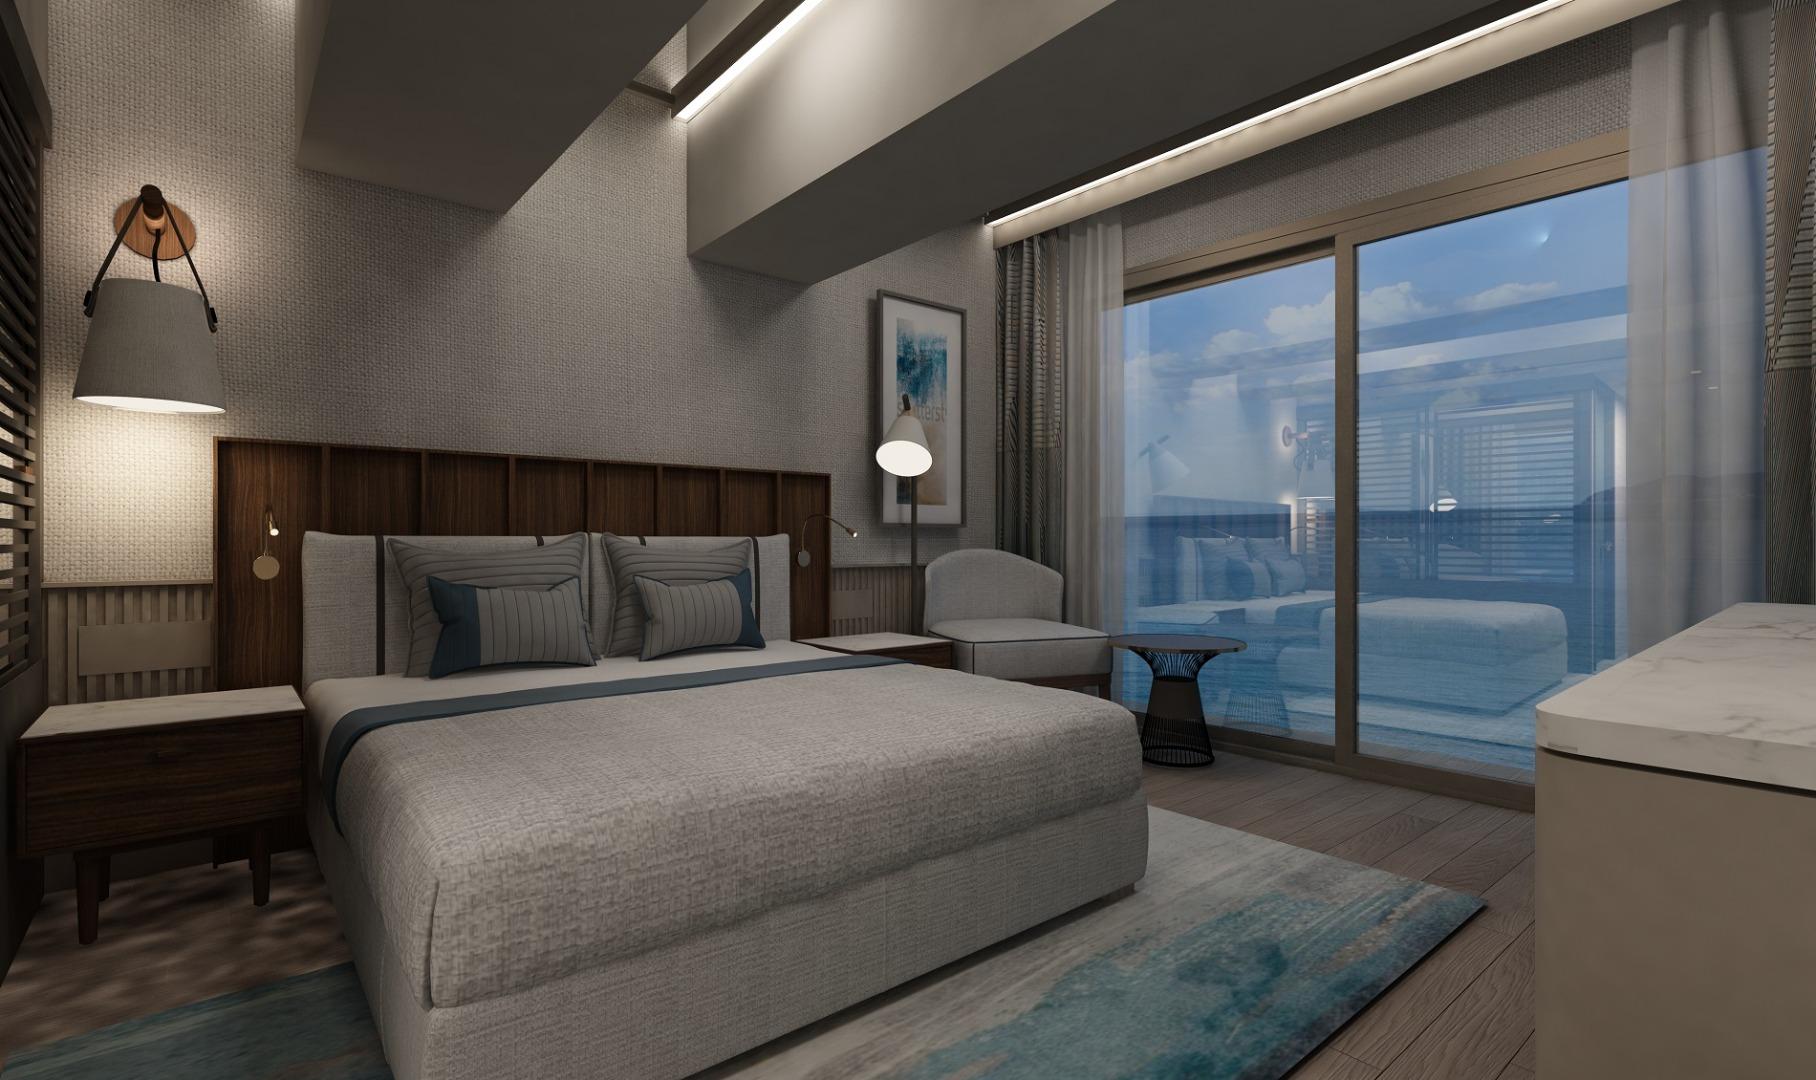 Seaden Quality Resort & Spa Oda Resimleri